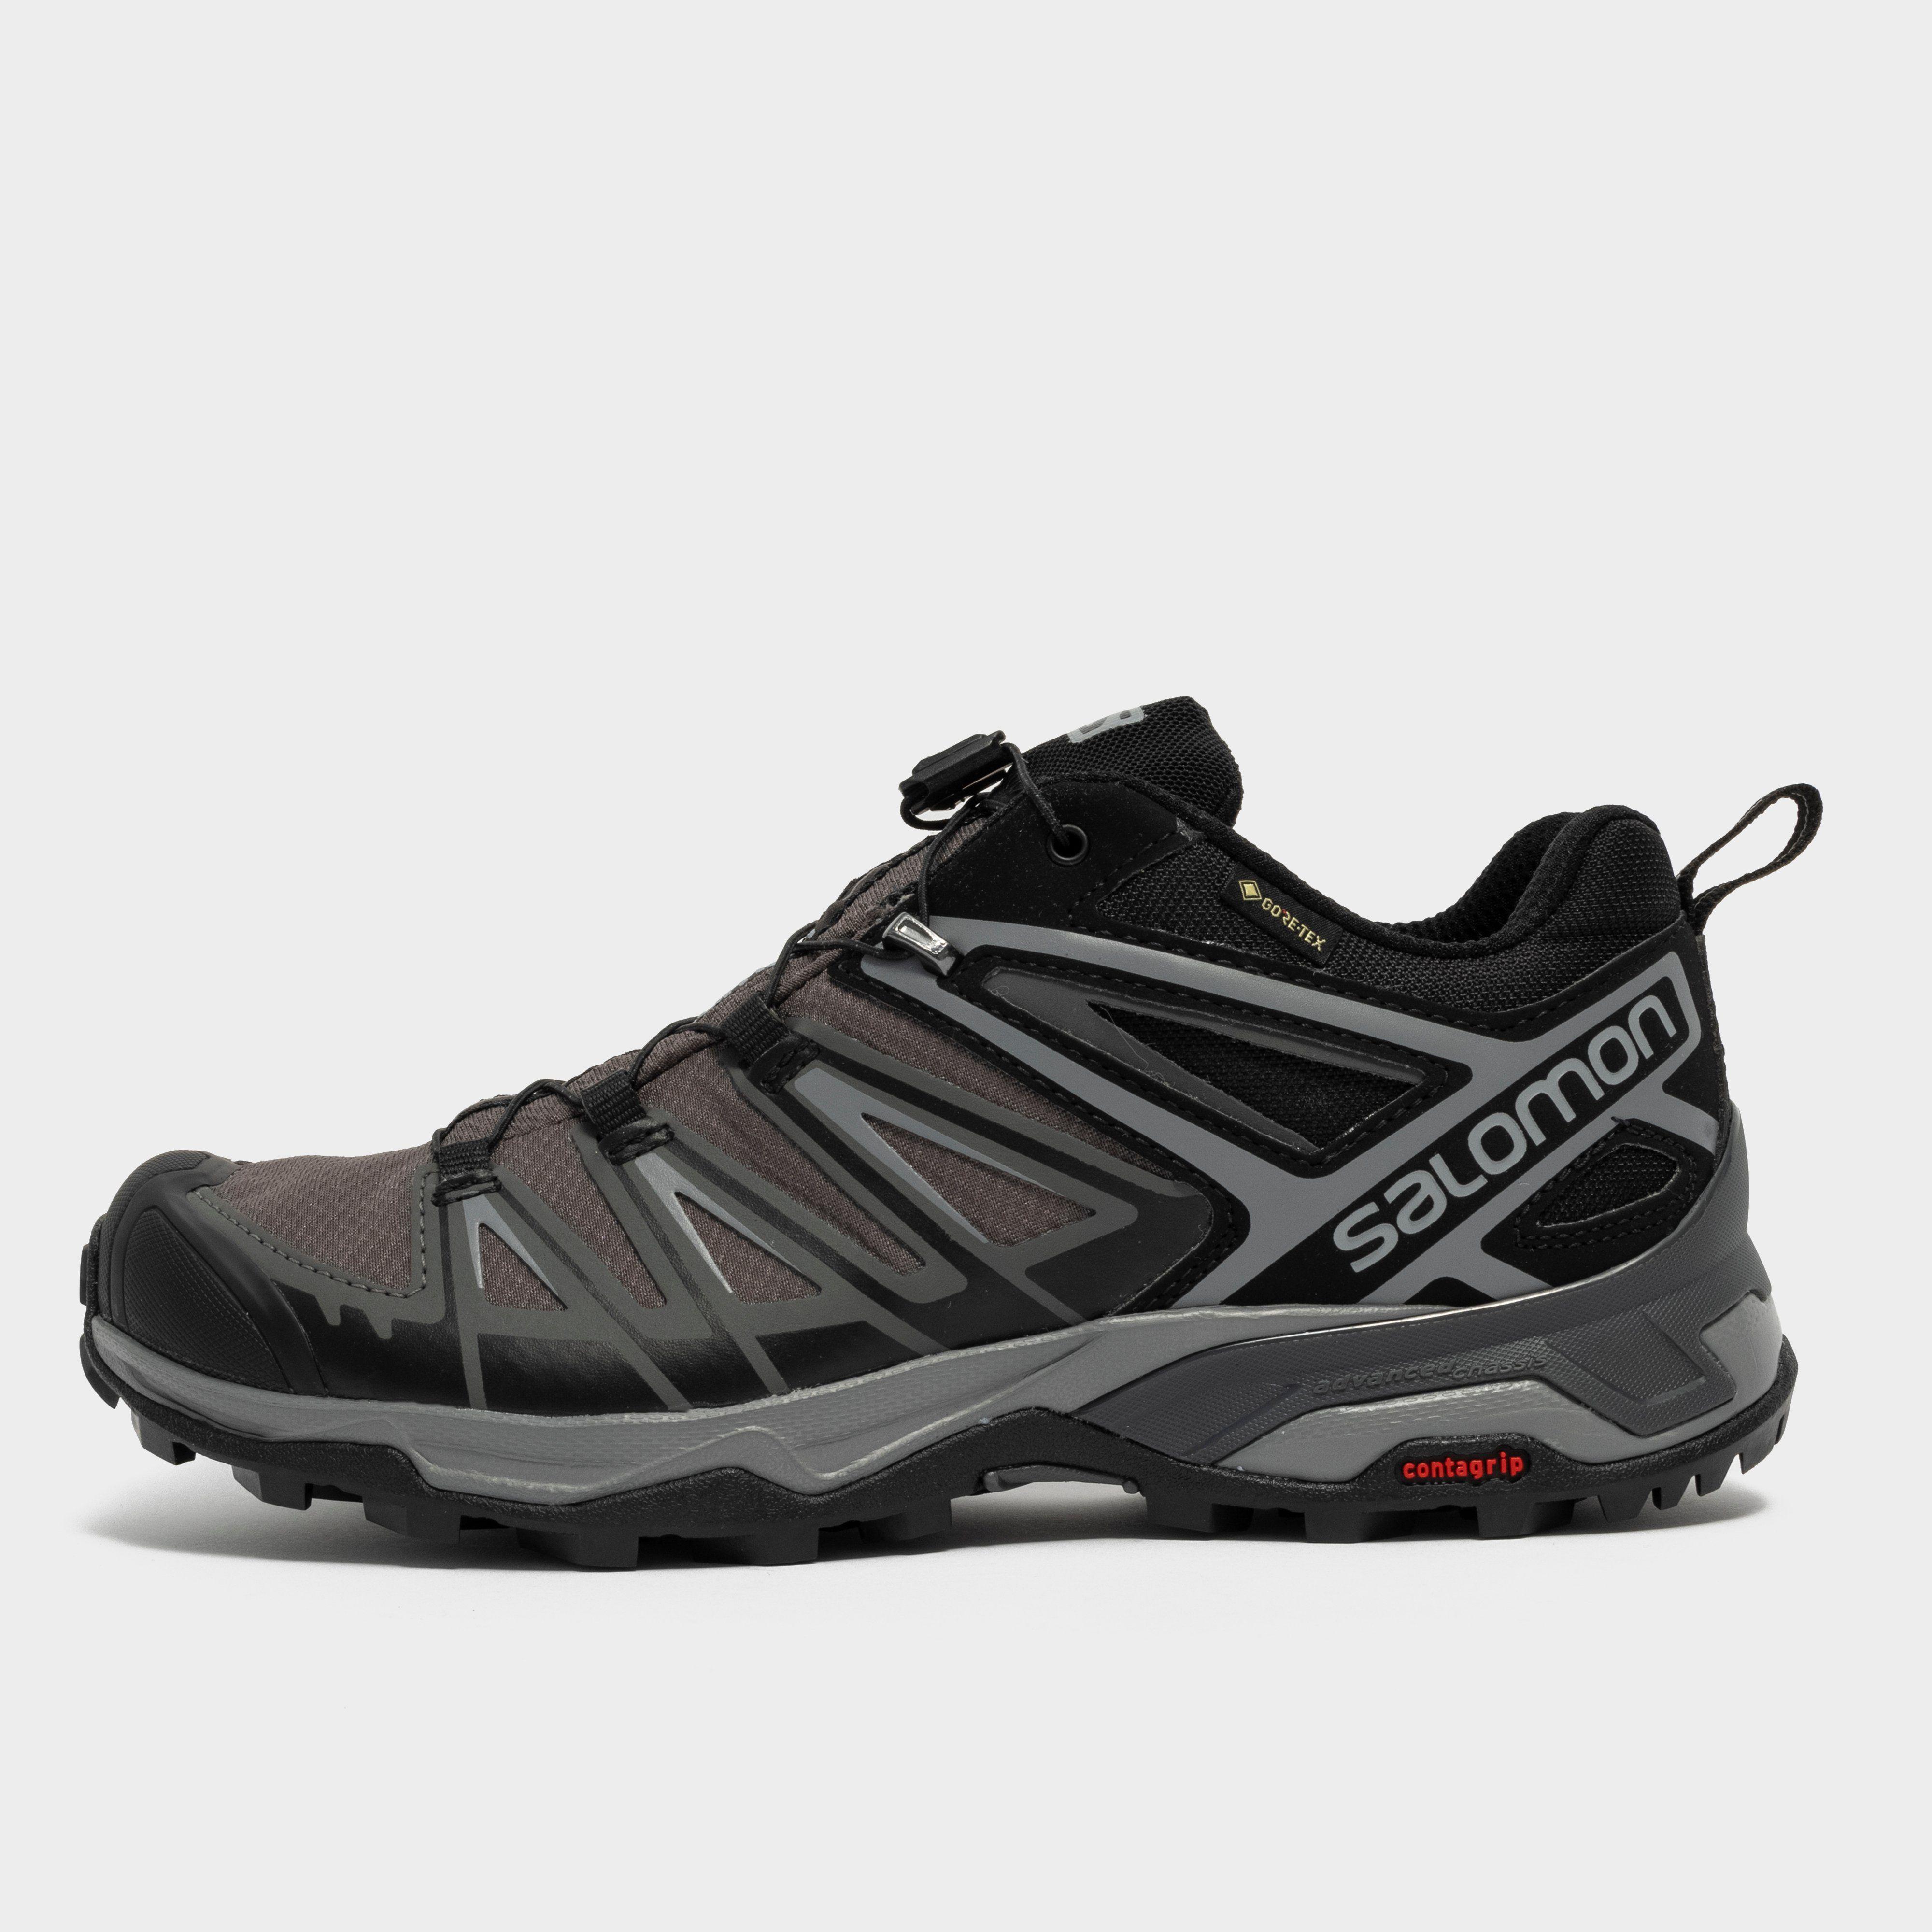 SALOMON Men's X Ultra 3 GORE-TEX® Shoes